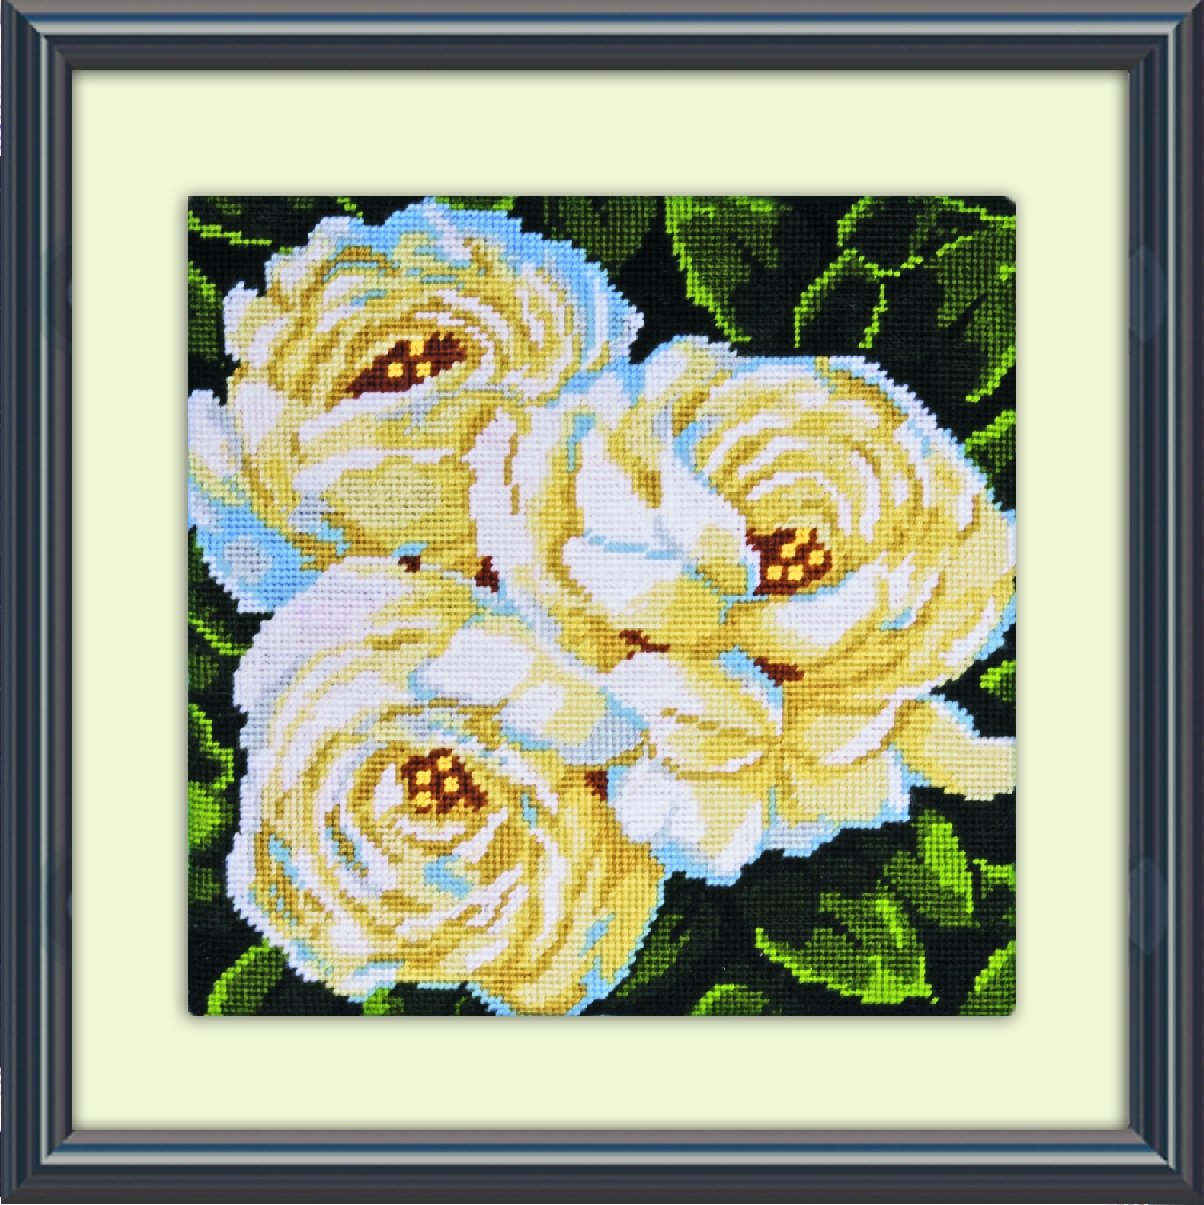 Tobin DW2515 Needlepoint Kit, 10 by 10-Inch, White Roses